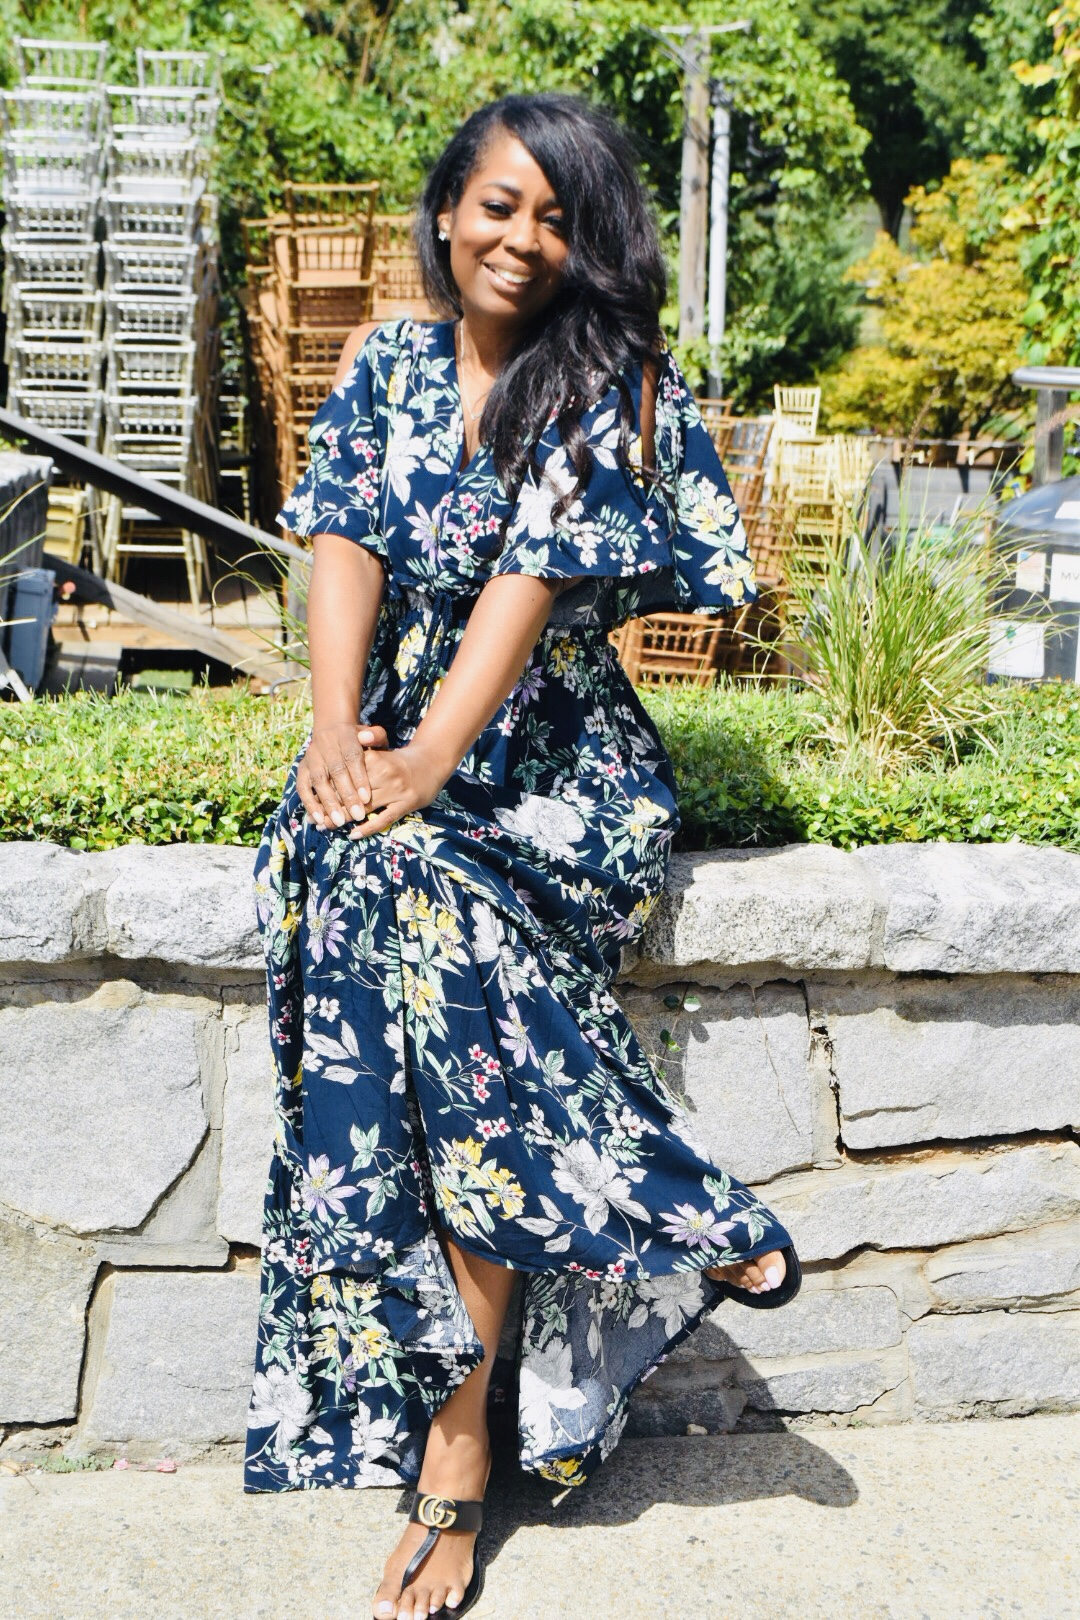 My Style: 70's Multicolor Floral Print Cold Shoulder Maxi Dress